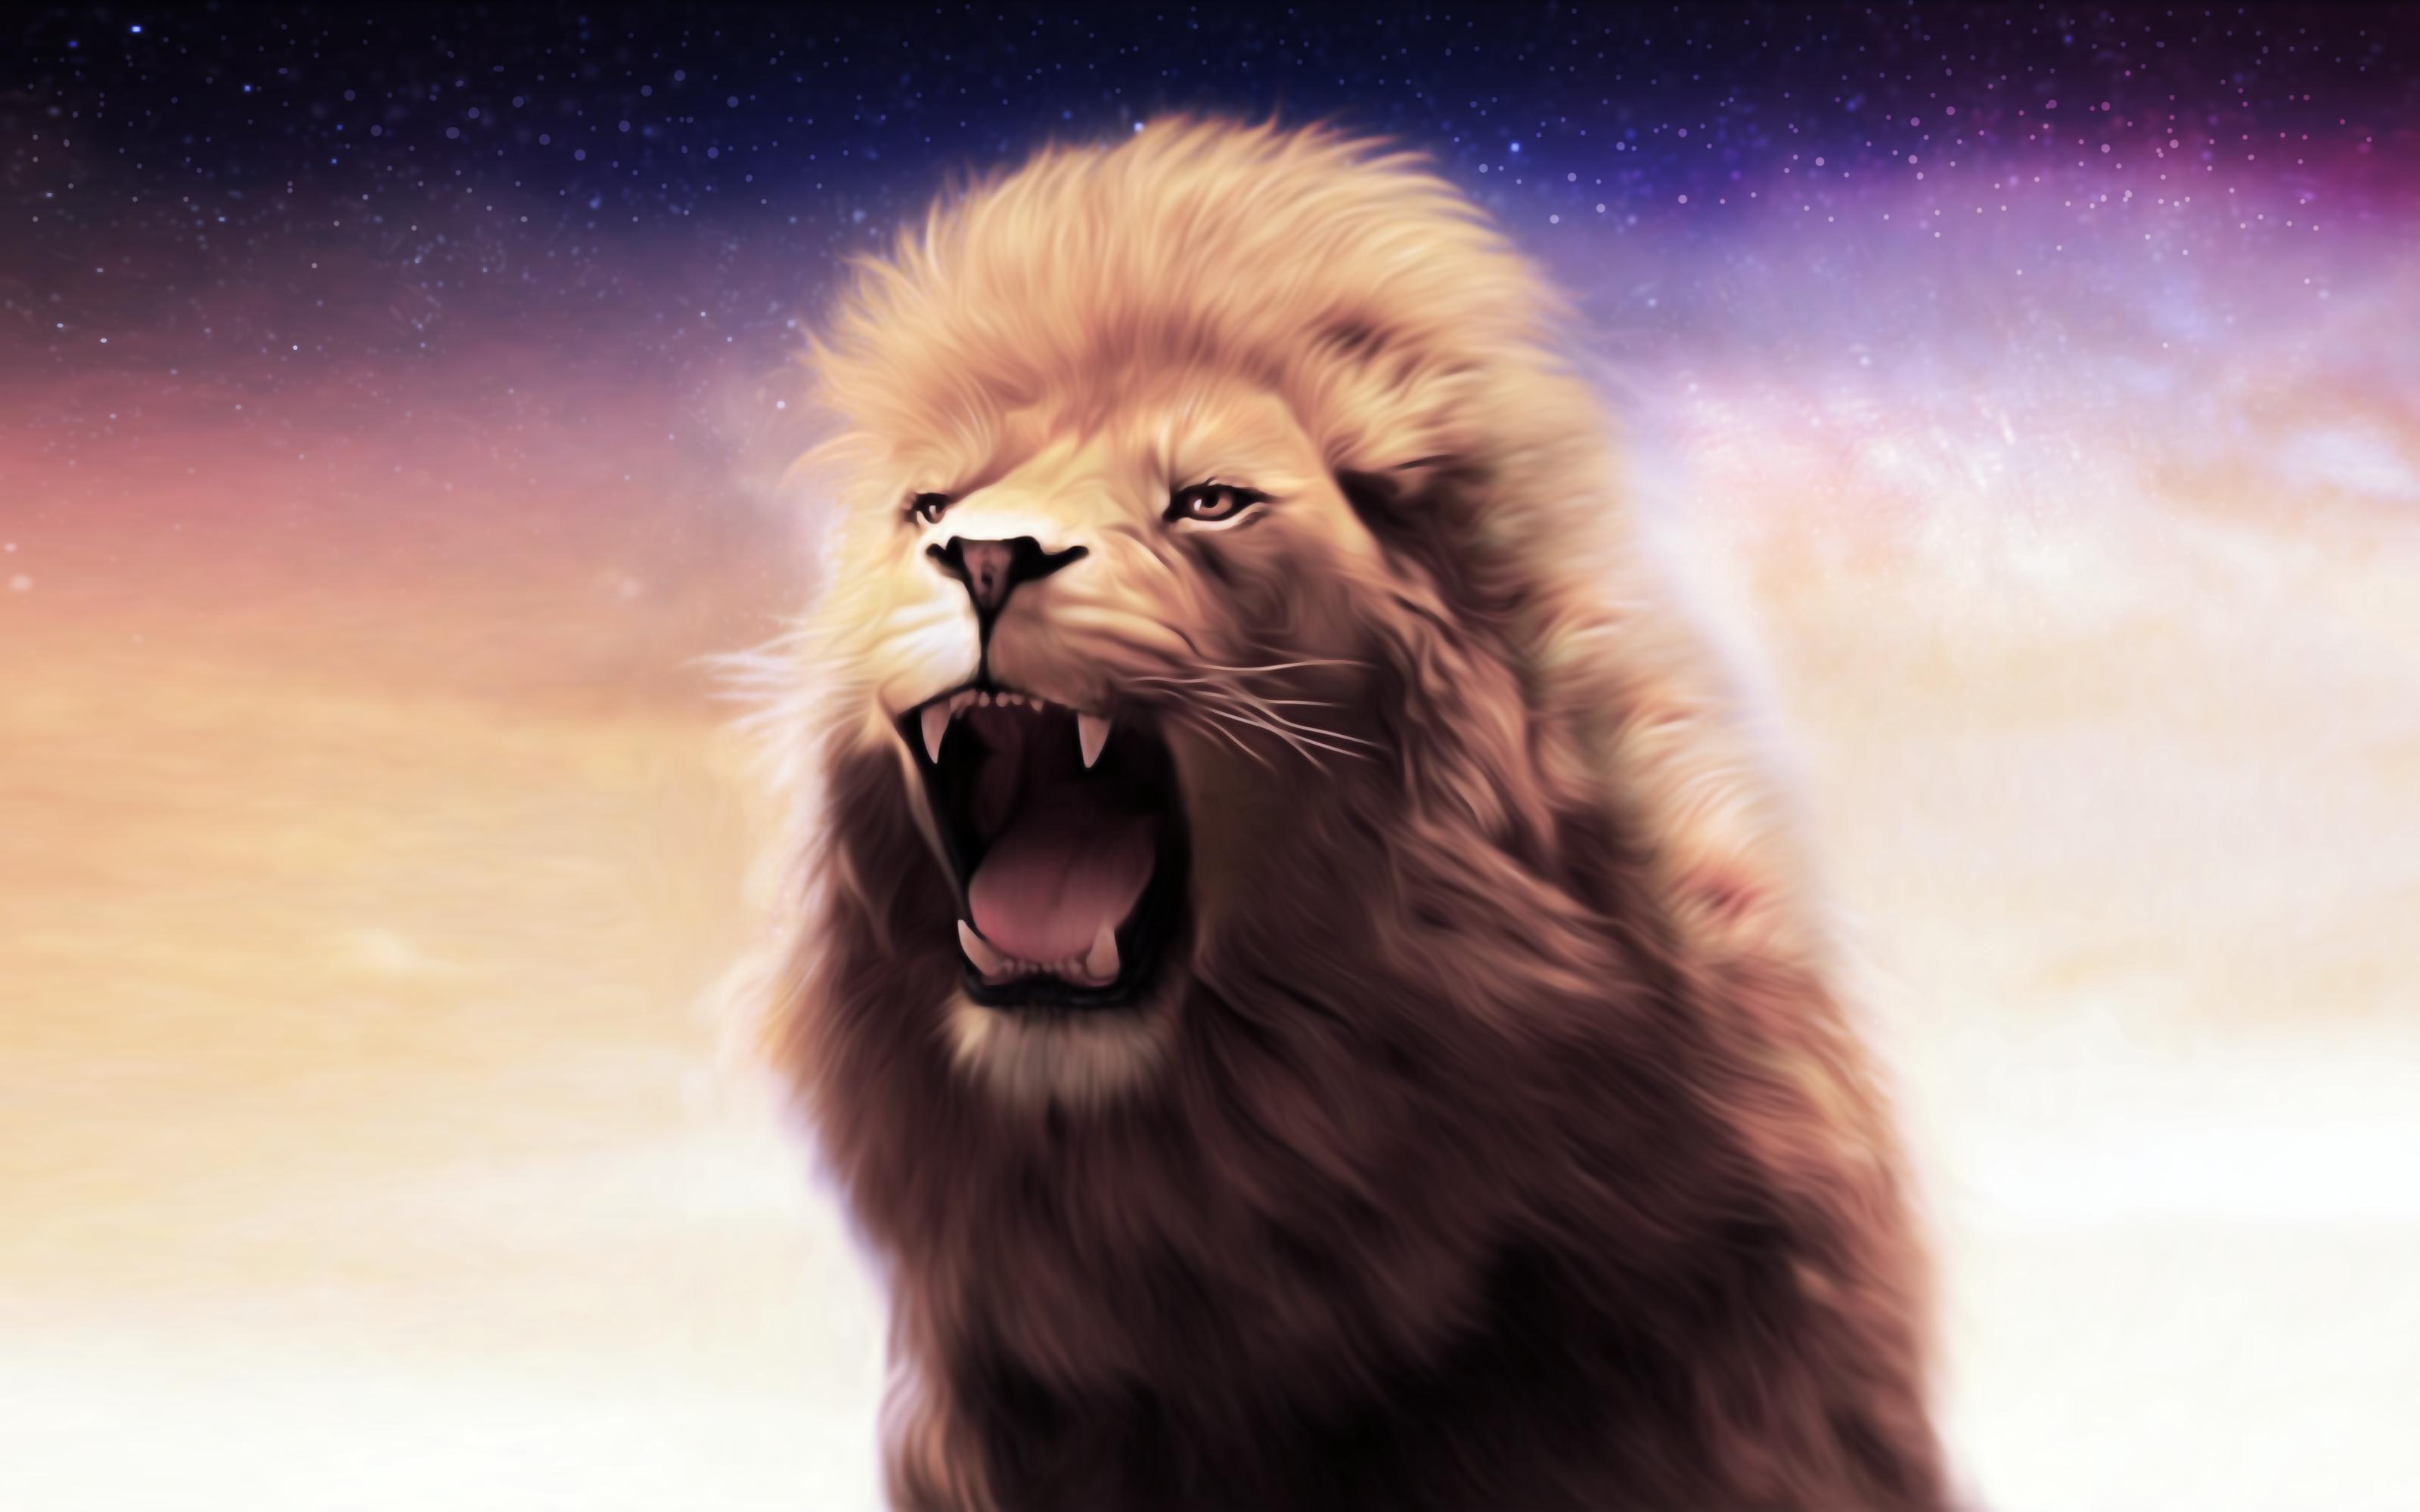 mac os x mountain lion iphone wallpaper hd by tj on deviantart